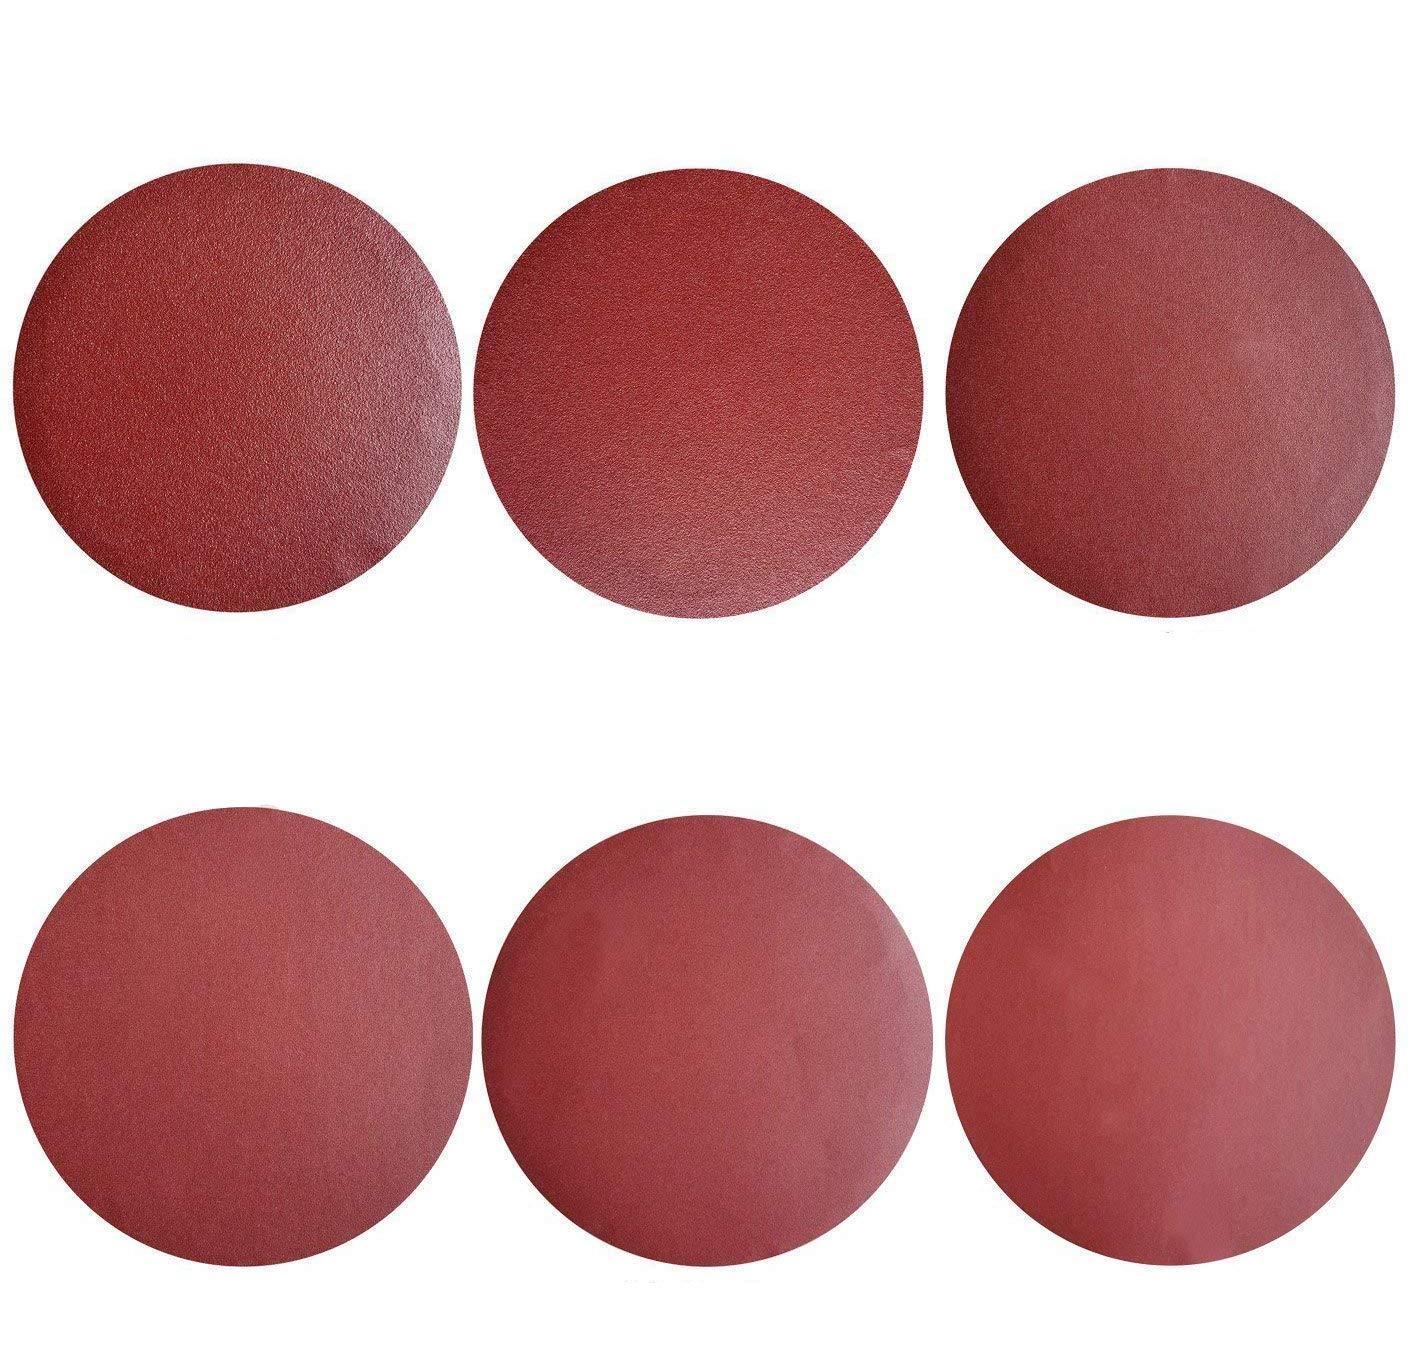 GeBot 50PCS 12-Inch NO-Hole PSA Aluminum Oxide Sanding Disc Self Stick Assorted